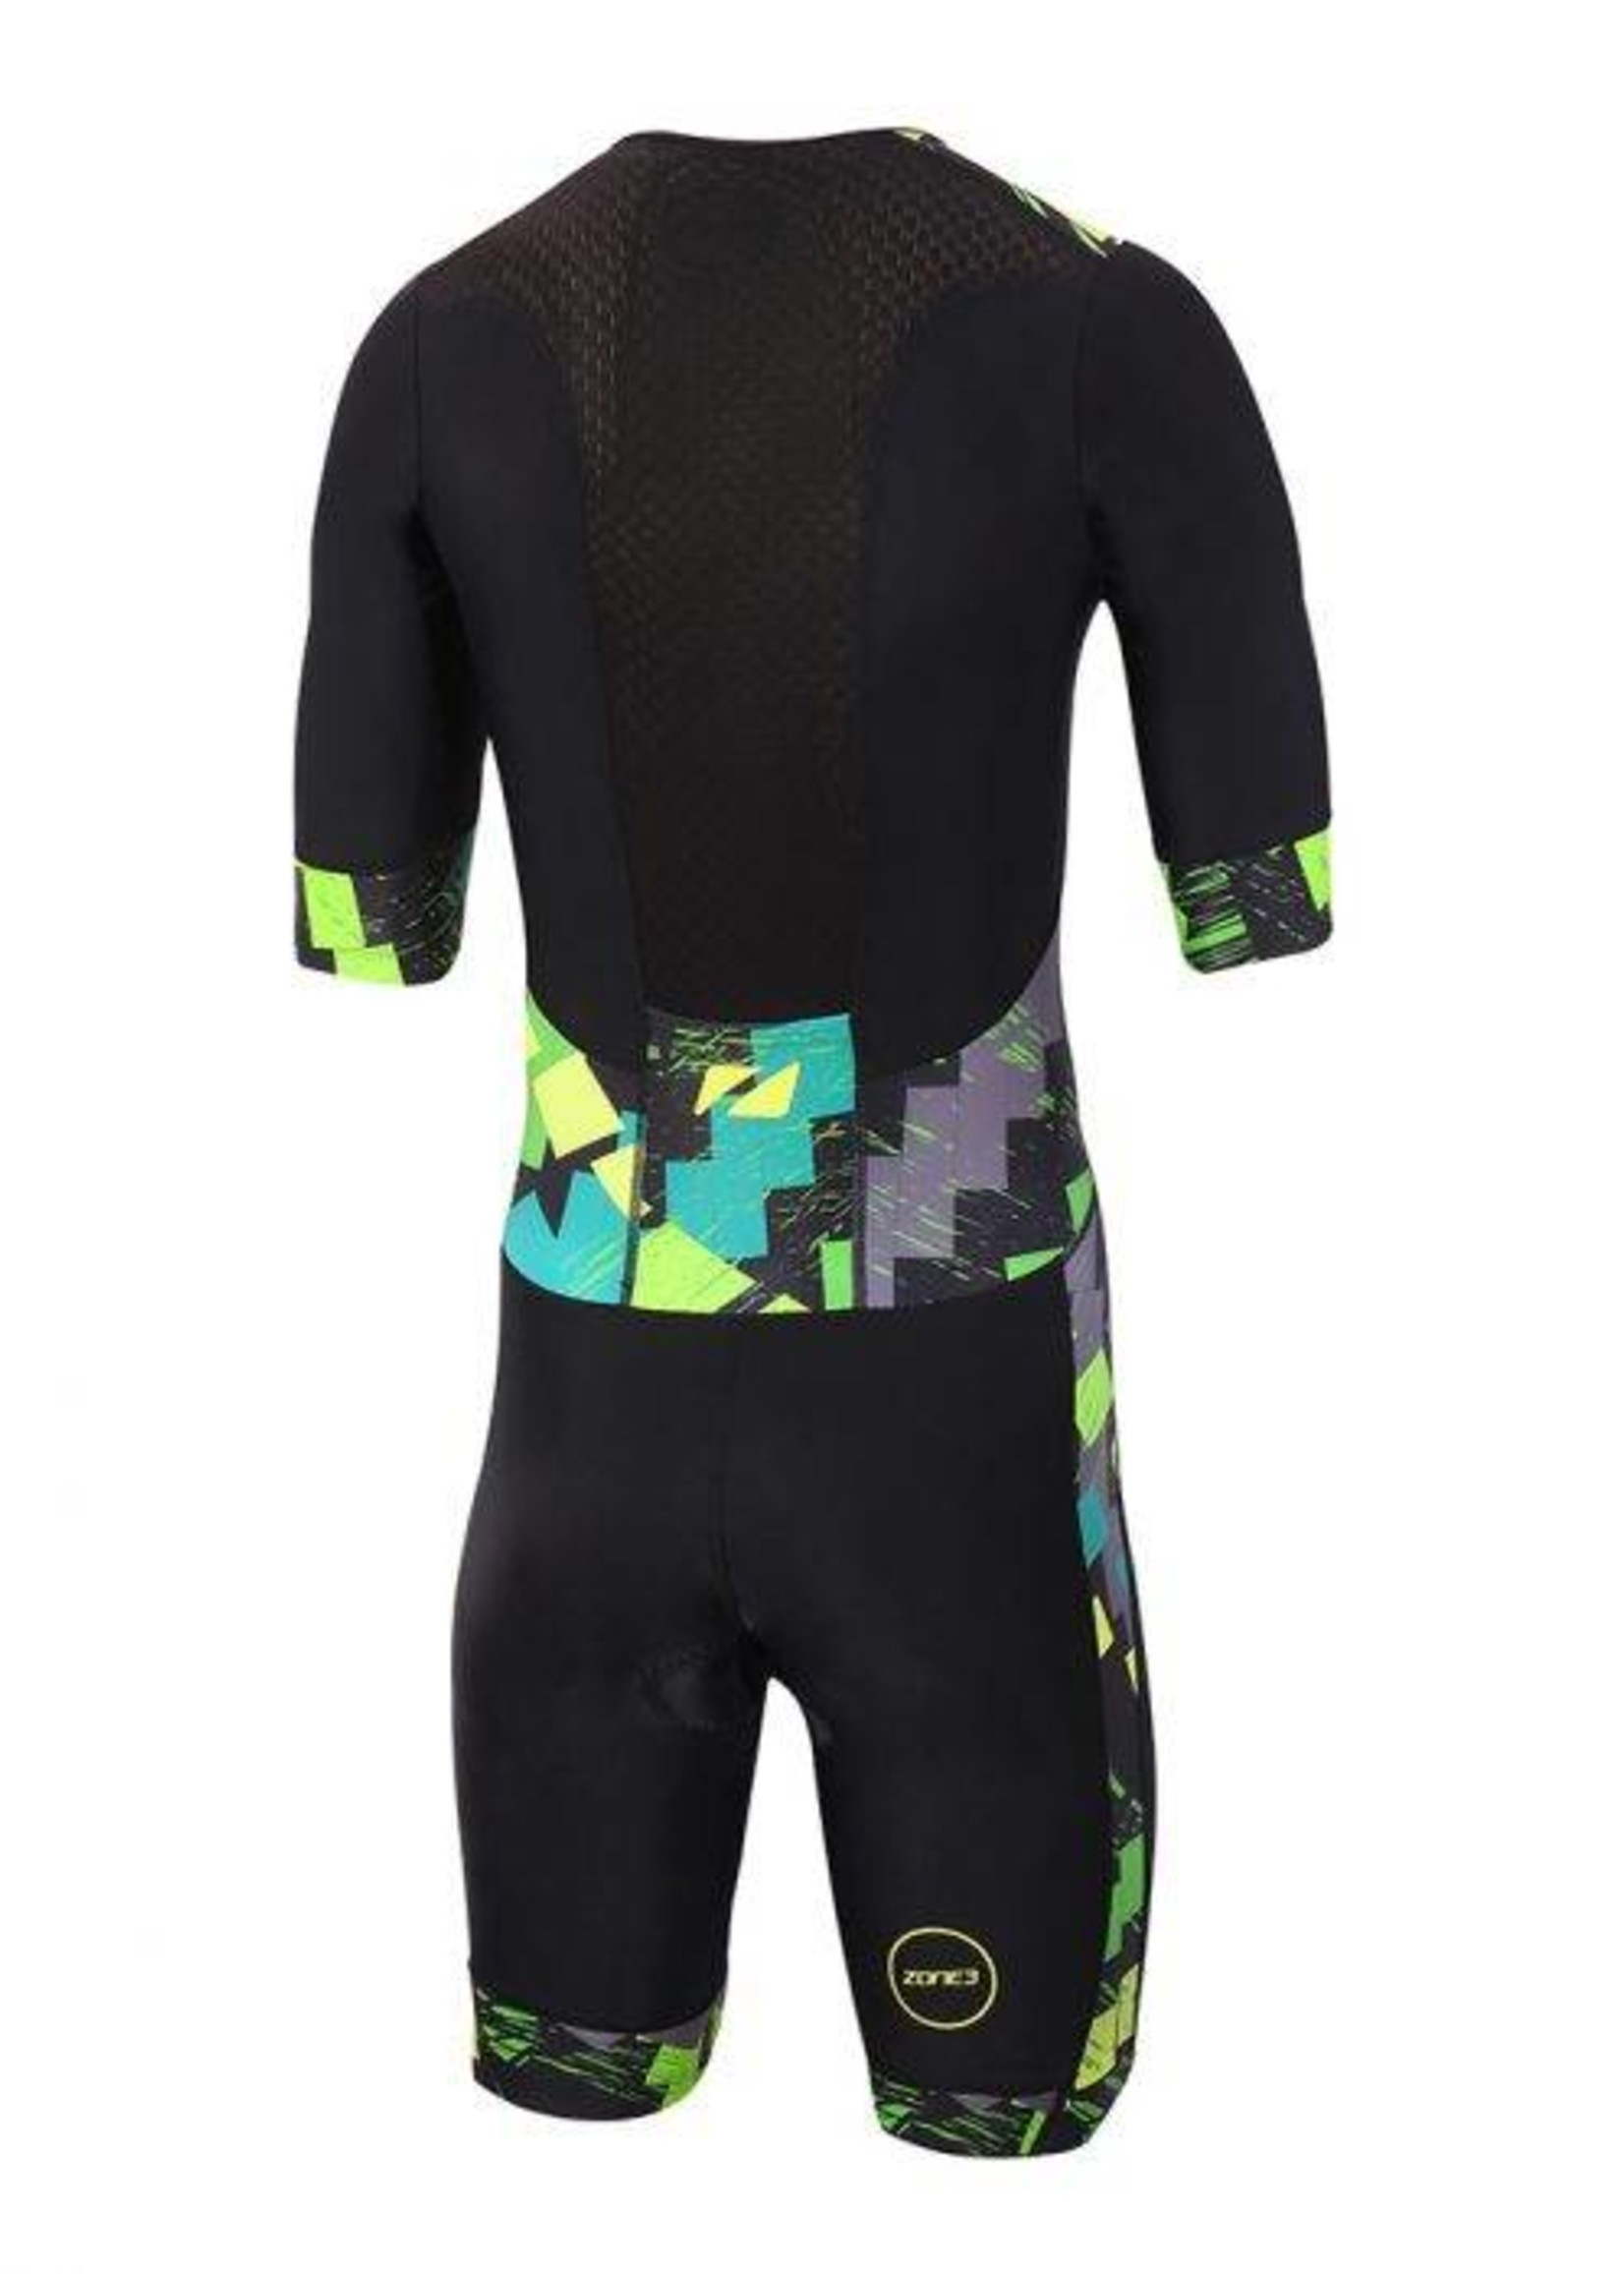 Zone 3 Zone 3 Activate+ Short Sleeve Trisuit Mens